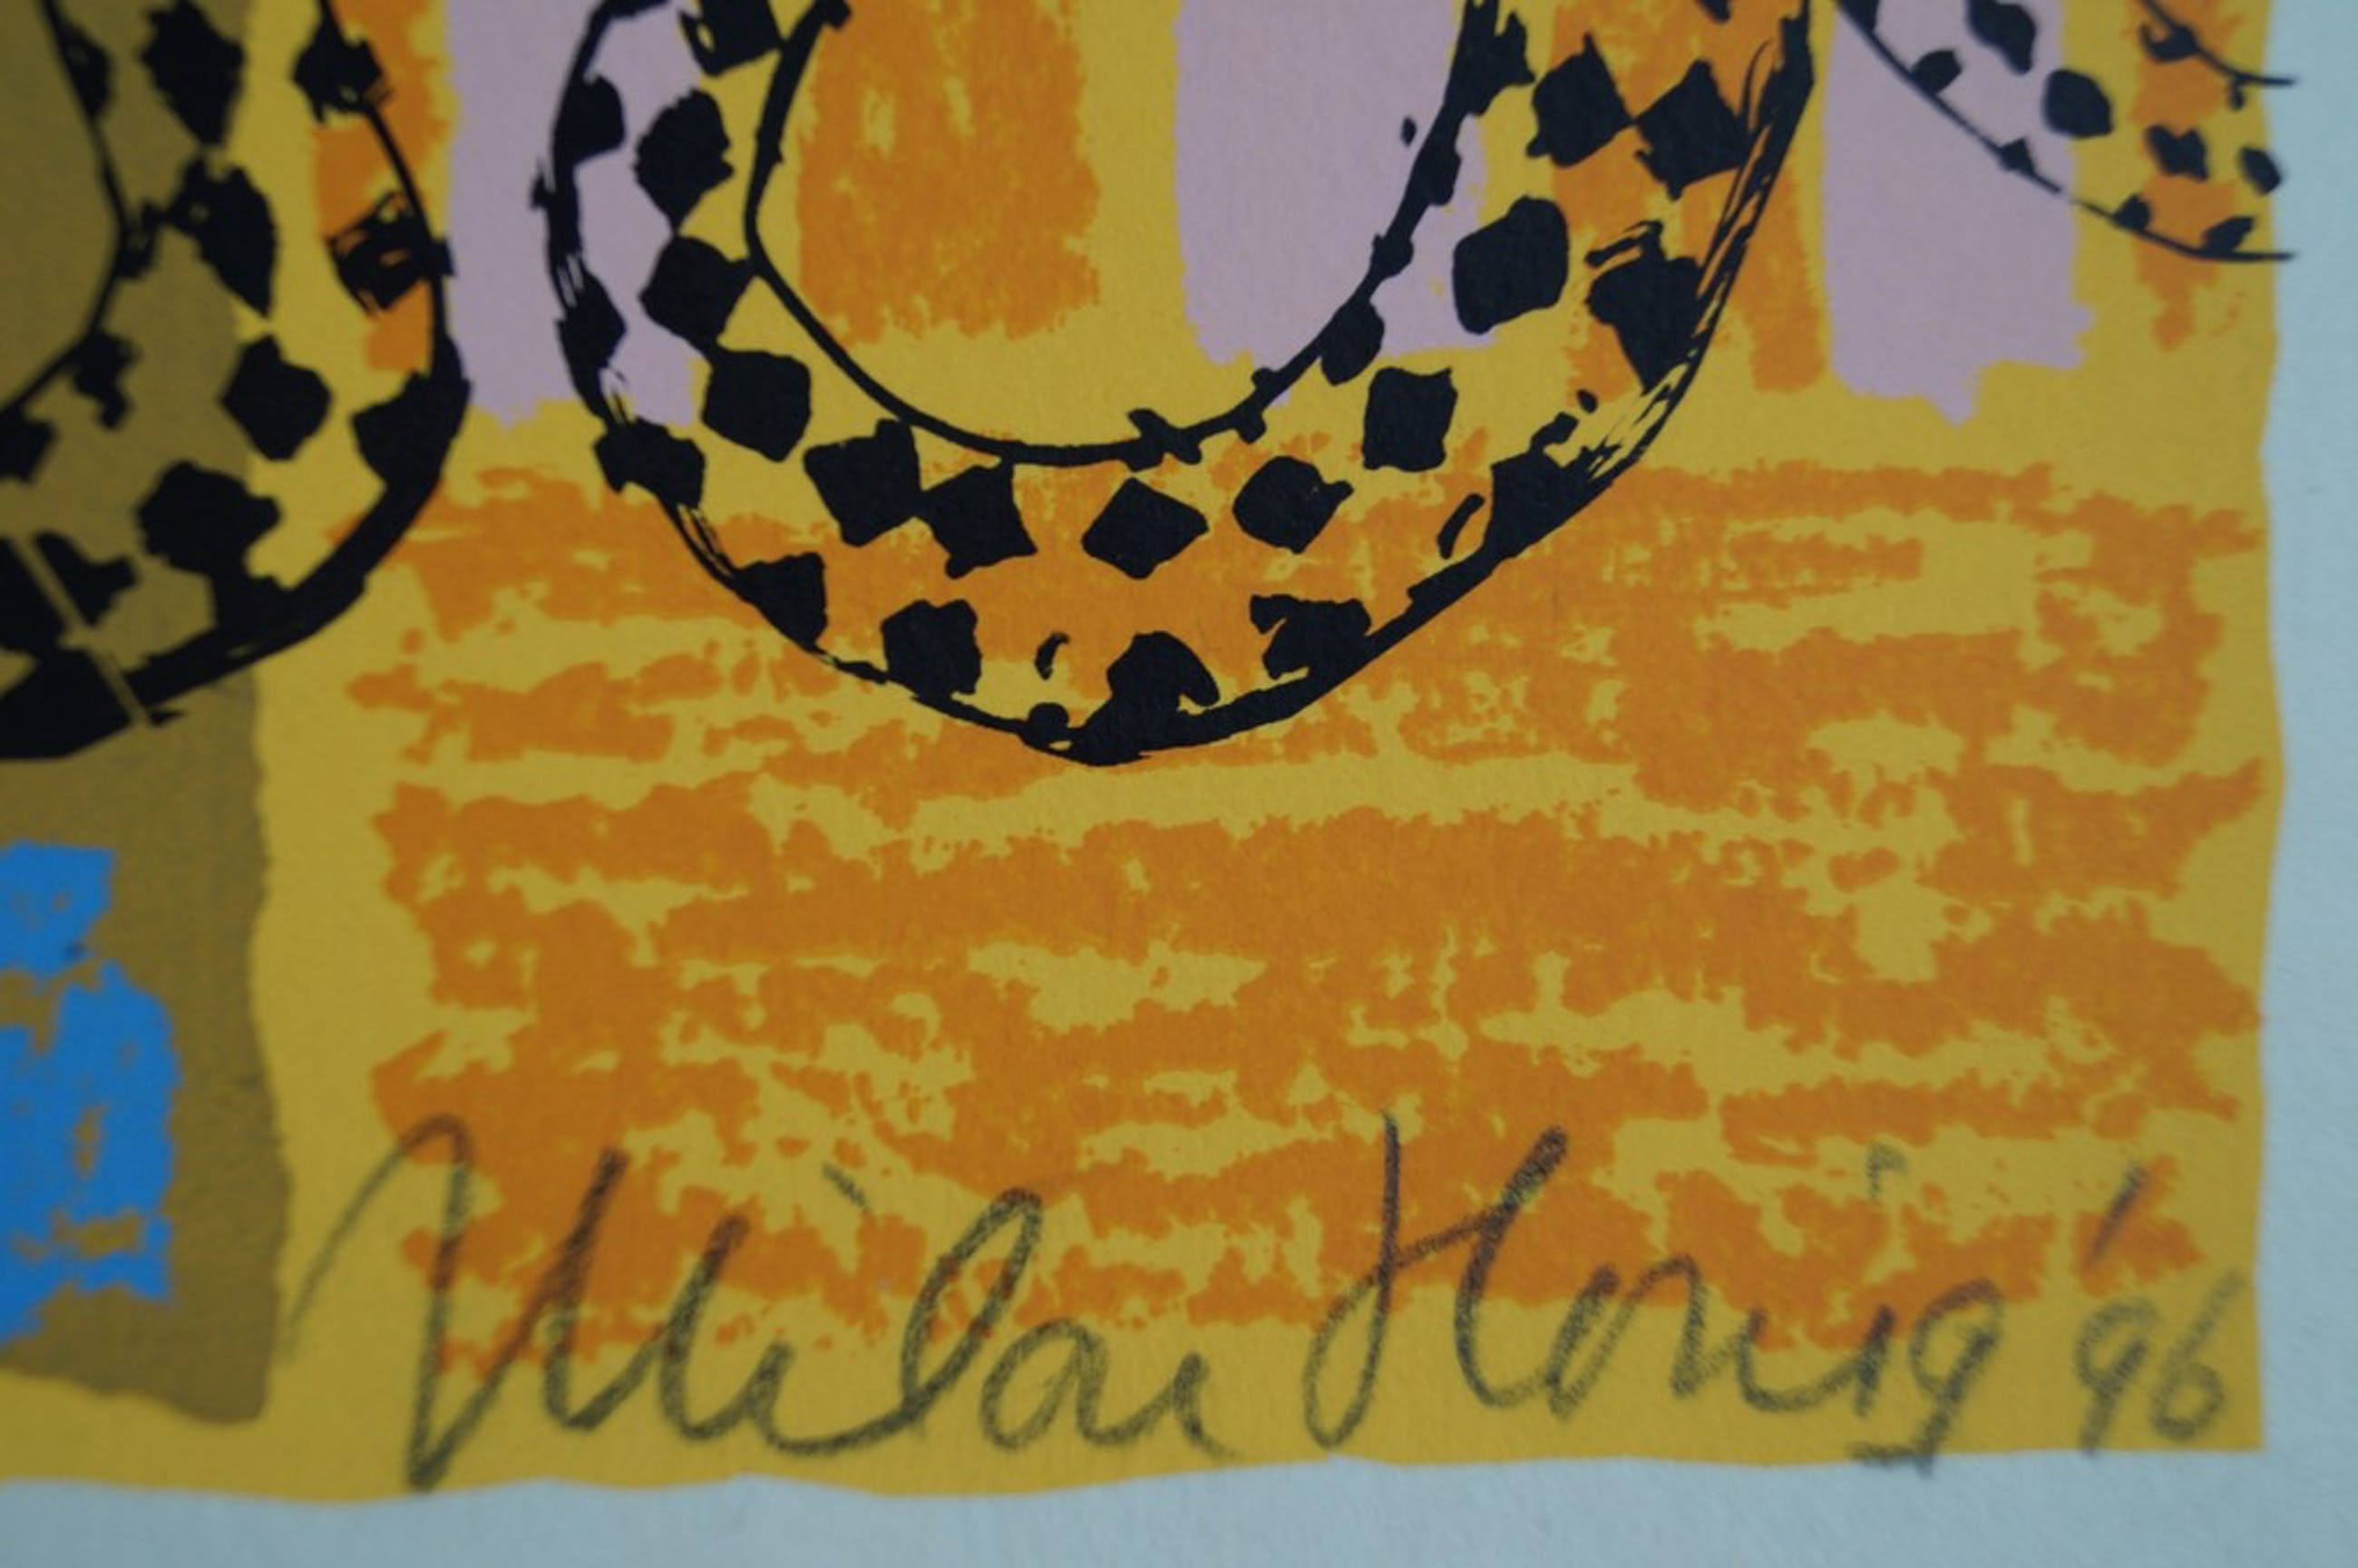 Milou Honig - Epke I - gesigneerde zeefdruk - oplage 24 ex. 1996 kopen? Bied vanaf 1!